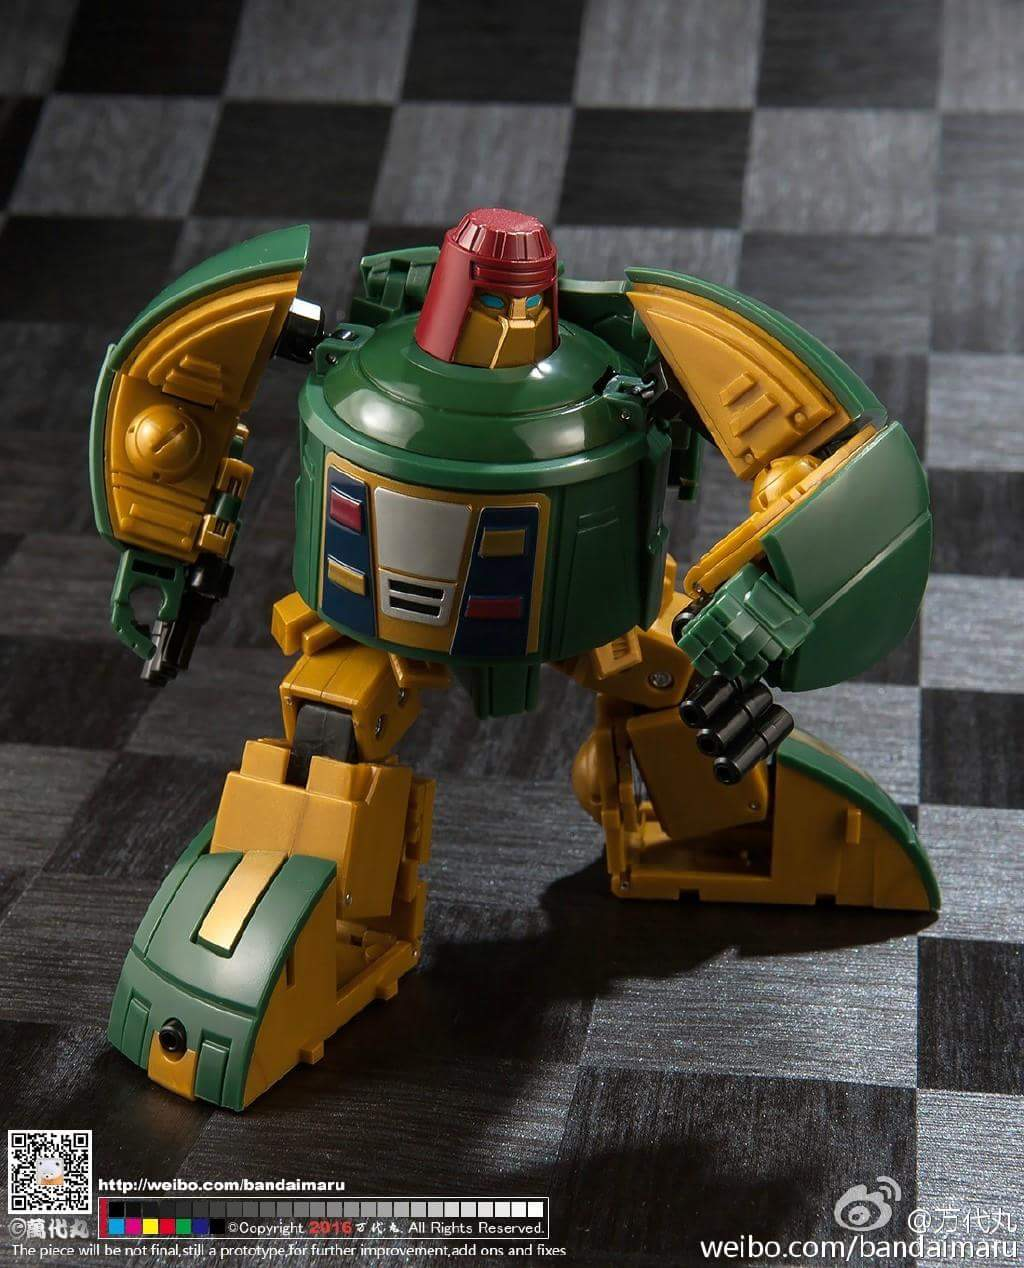 [Toyworld][Zeta Toys] Produit Tiers - Minibots MP - Gamme EX - Page 2 H1p6TMX8